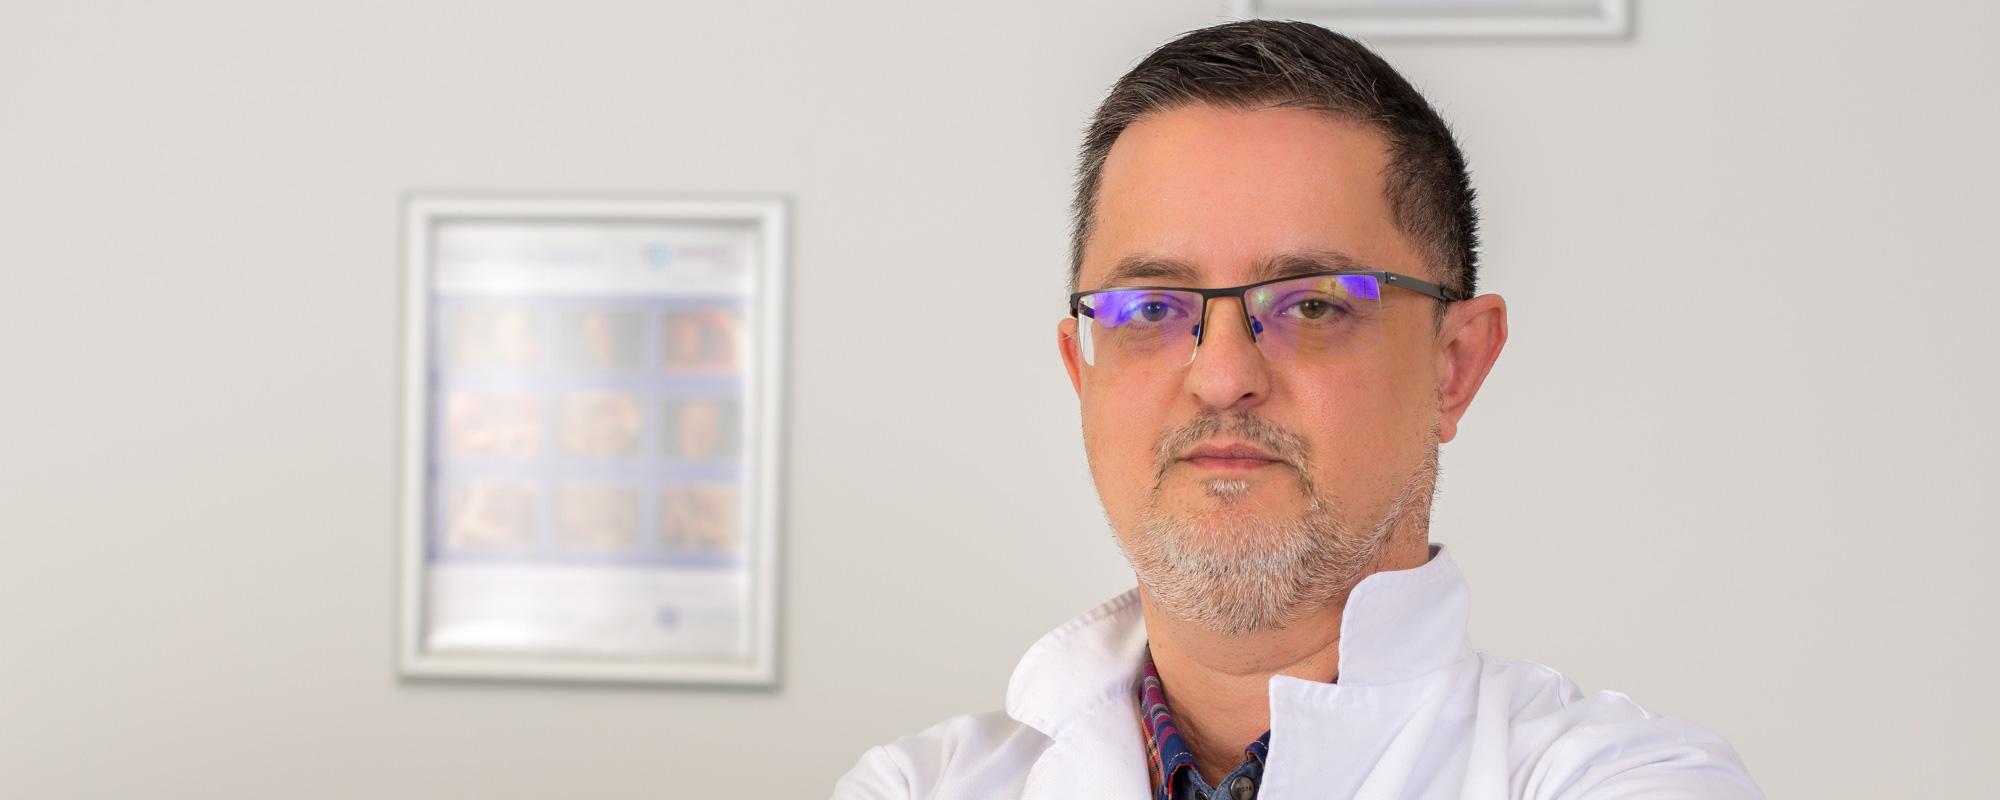 La noi nu vei gasi <br> doar cei mai <span>buni specialisti,</span> dar si <br> cea mai <span>avansata tehnologie</span> in toate domeniile medicale. <br> <span>Dr. Nicolae Cristian Florin</span>